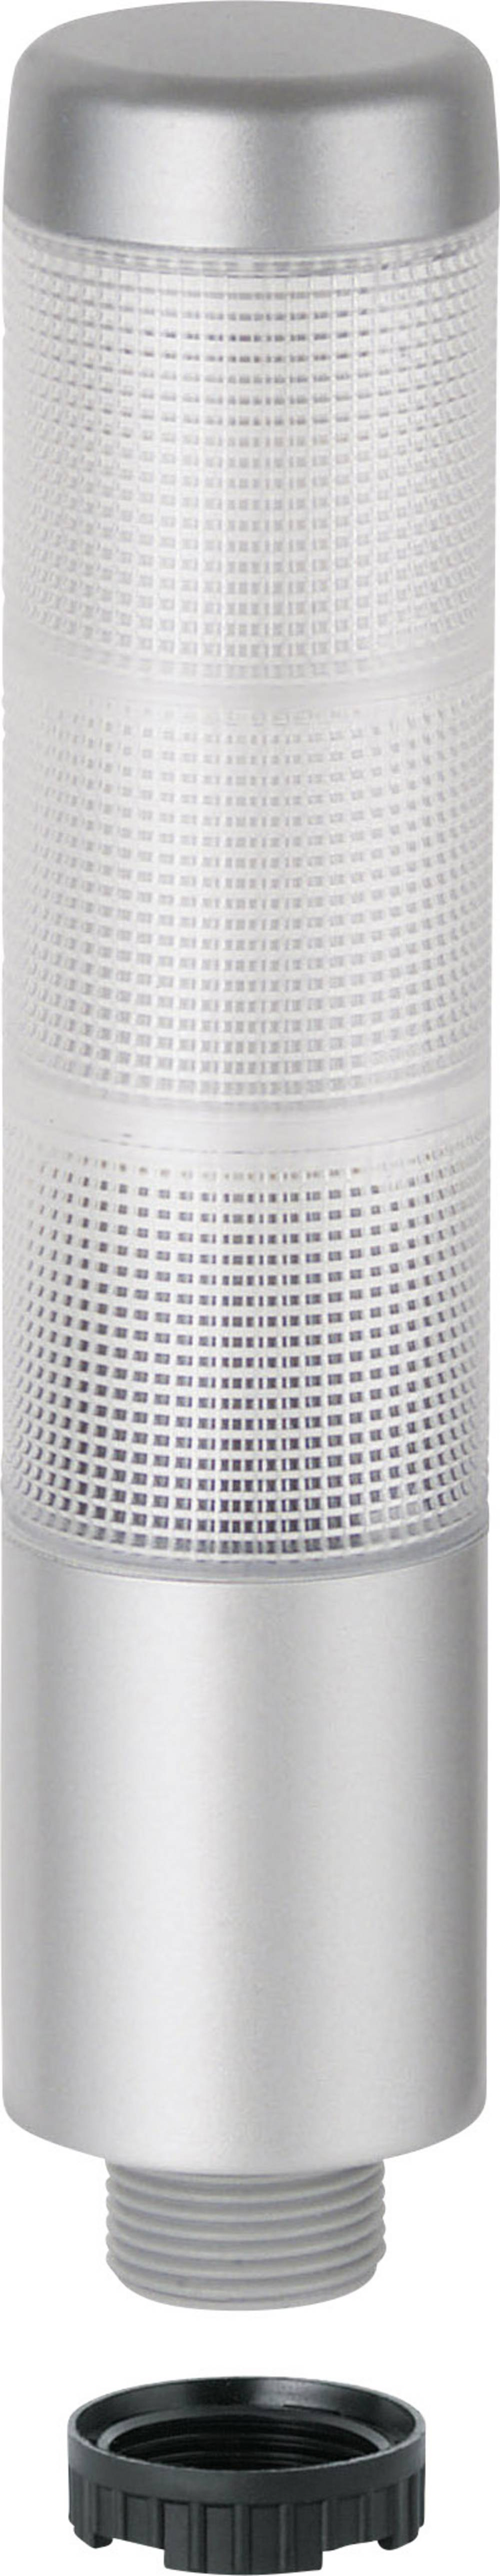 LED signalni stup Kompakt 37 698.310.75 Werma Signaltechnik s prozirnim kalotama 24 V AC/DC struja 150 mA boja: zelena, žuta, cr